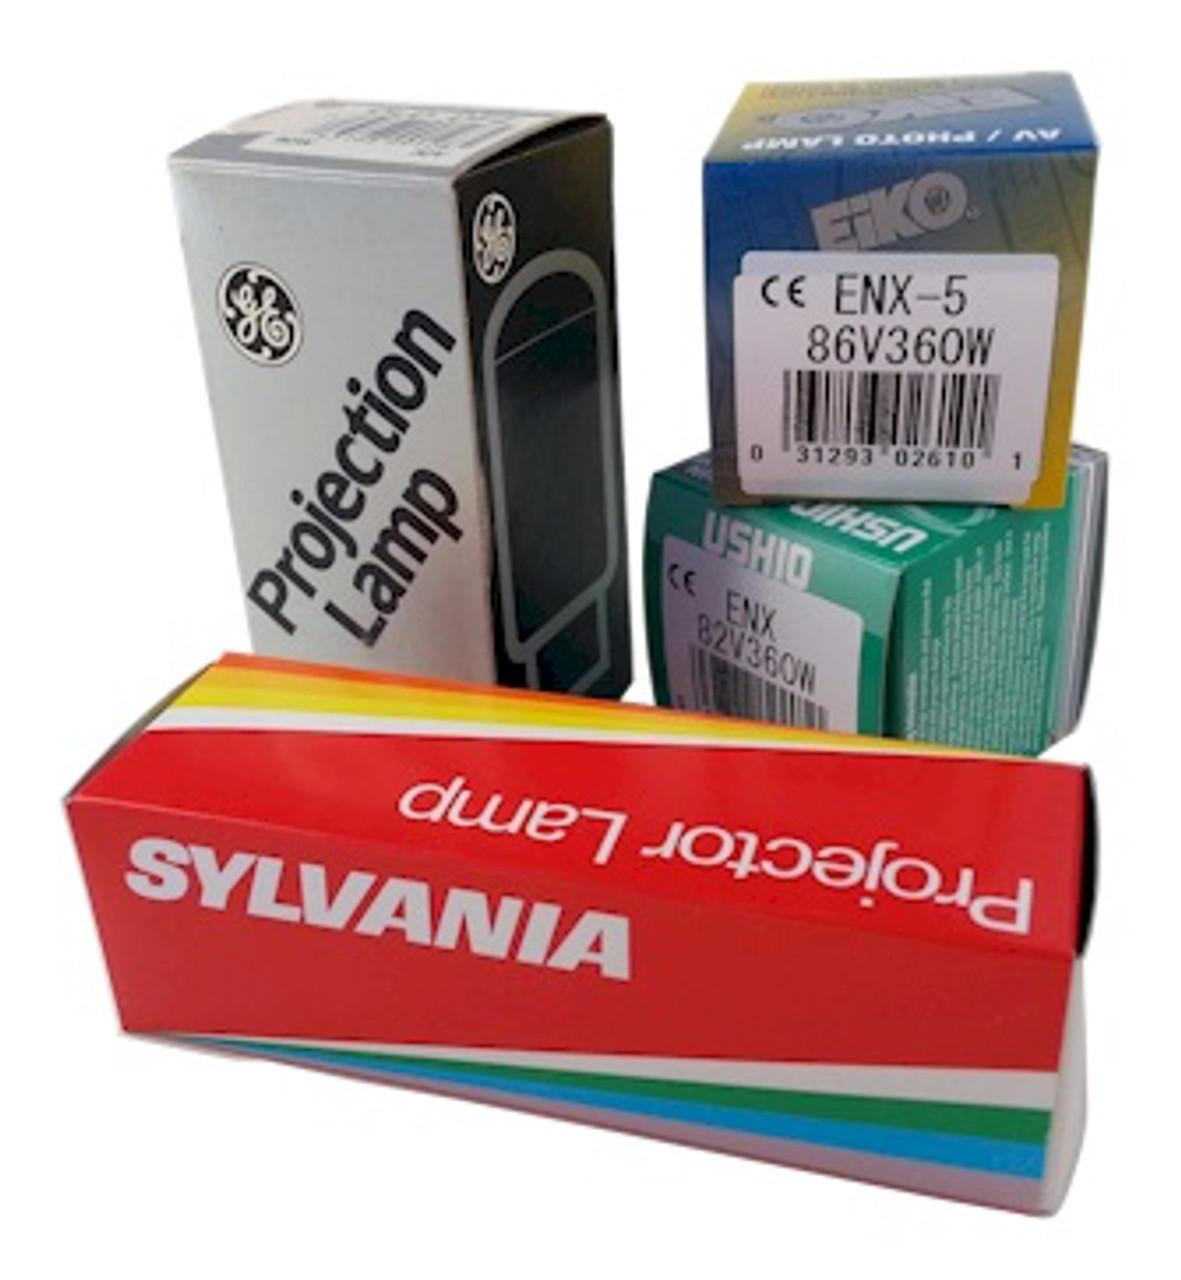 Vivitar - 6, E-32, E-33, E-34, E-36, E-54, E-74-6, E-74-VI, E-74, - Enlarger - Replacement Bulb Model- PH111A